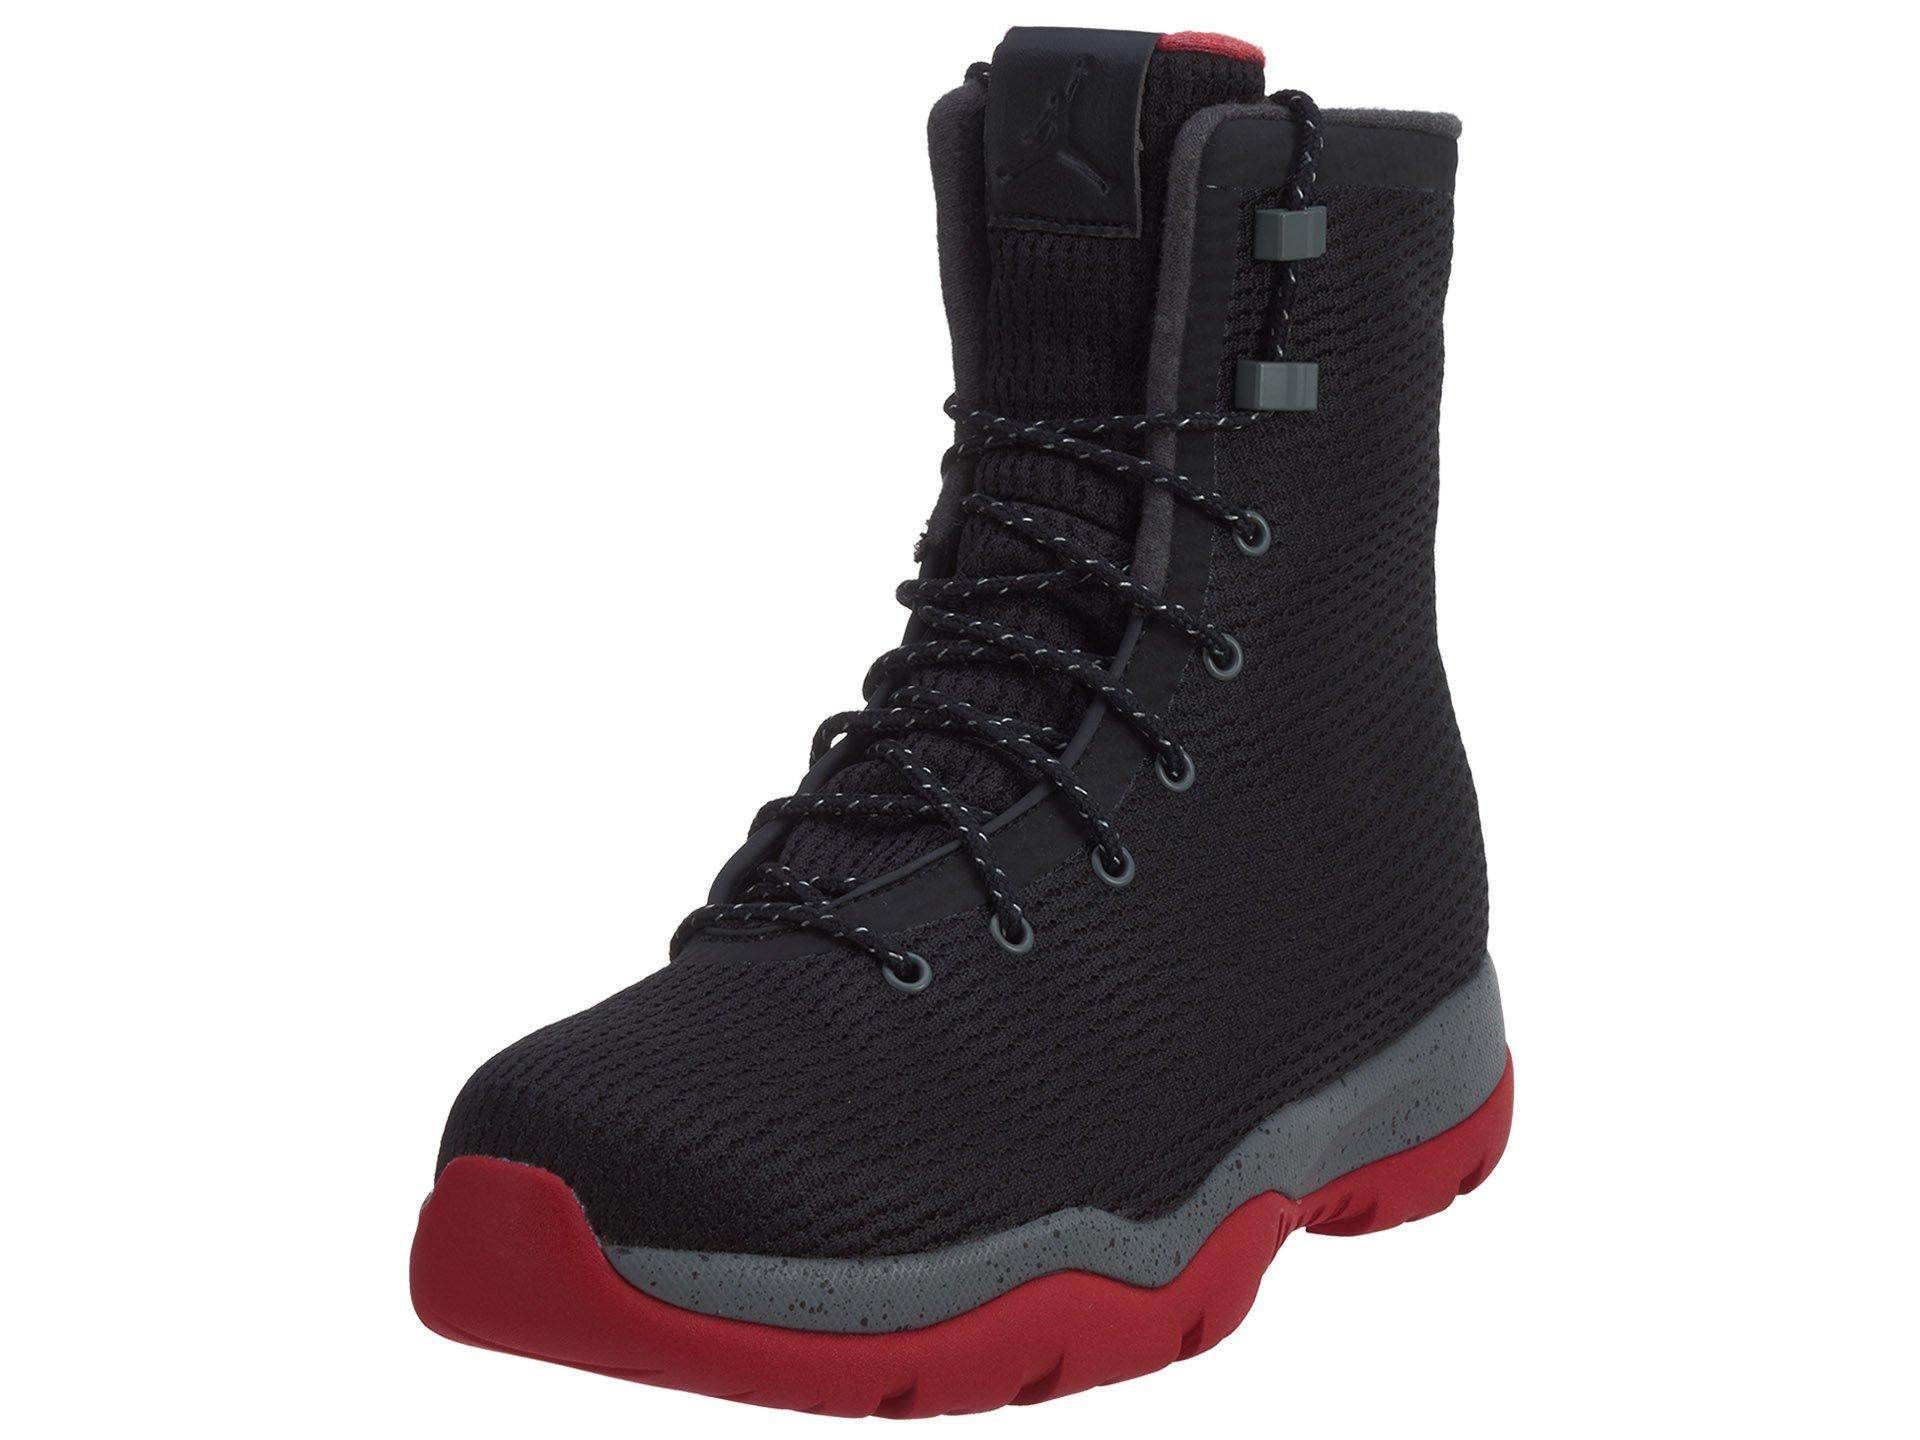 Nike Mens Jordan Future Boots Black/Cool Grey/Gym Red 854554-001 Size 10.5 by Jordan